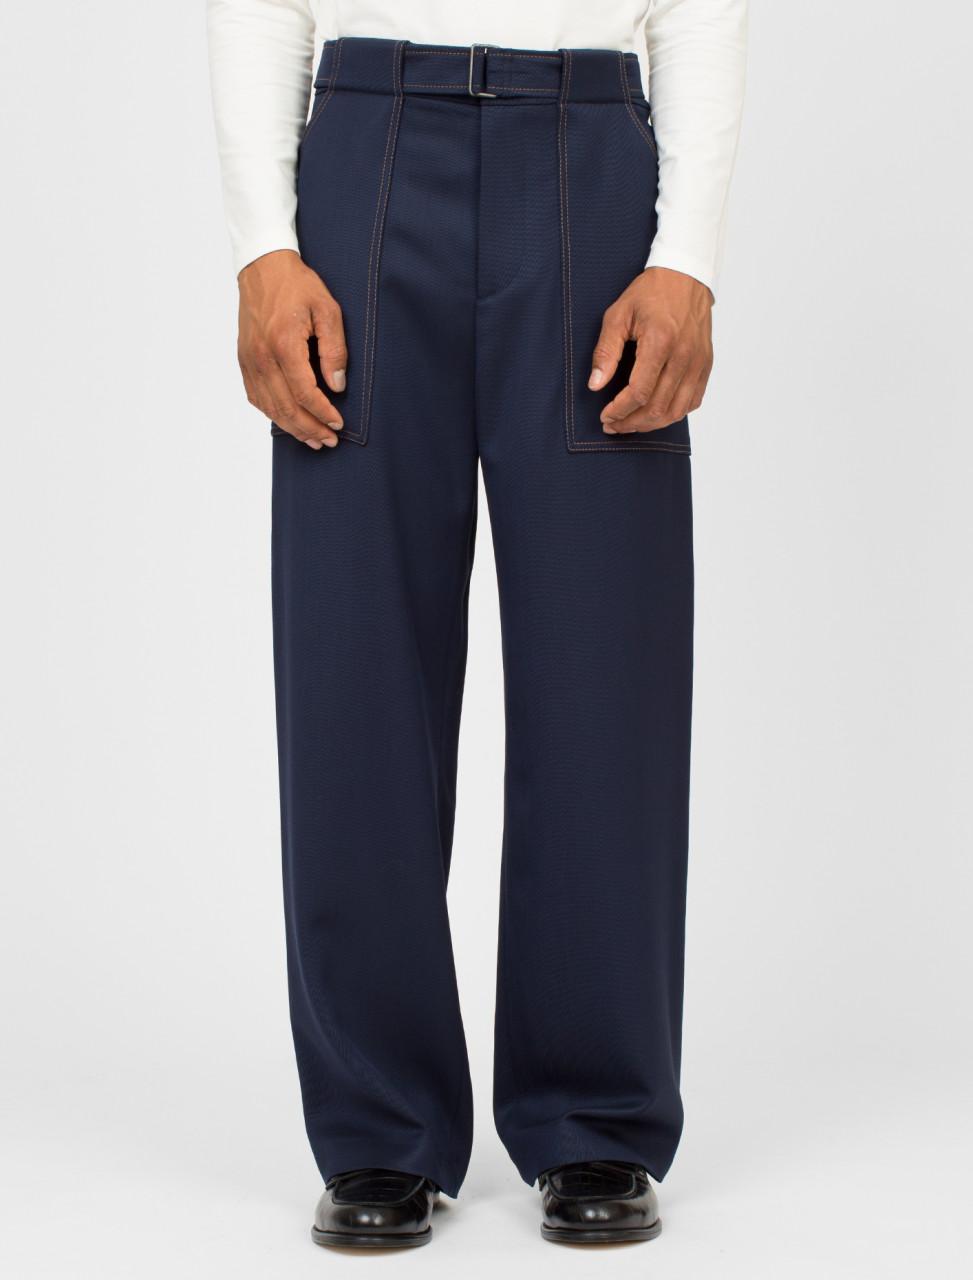 Kurt Belted Workwear Trouser